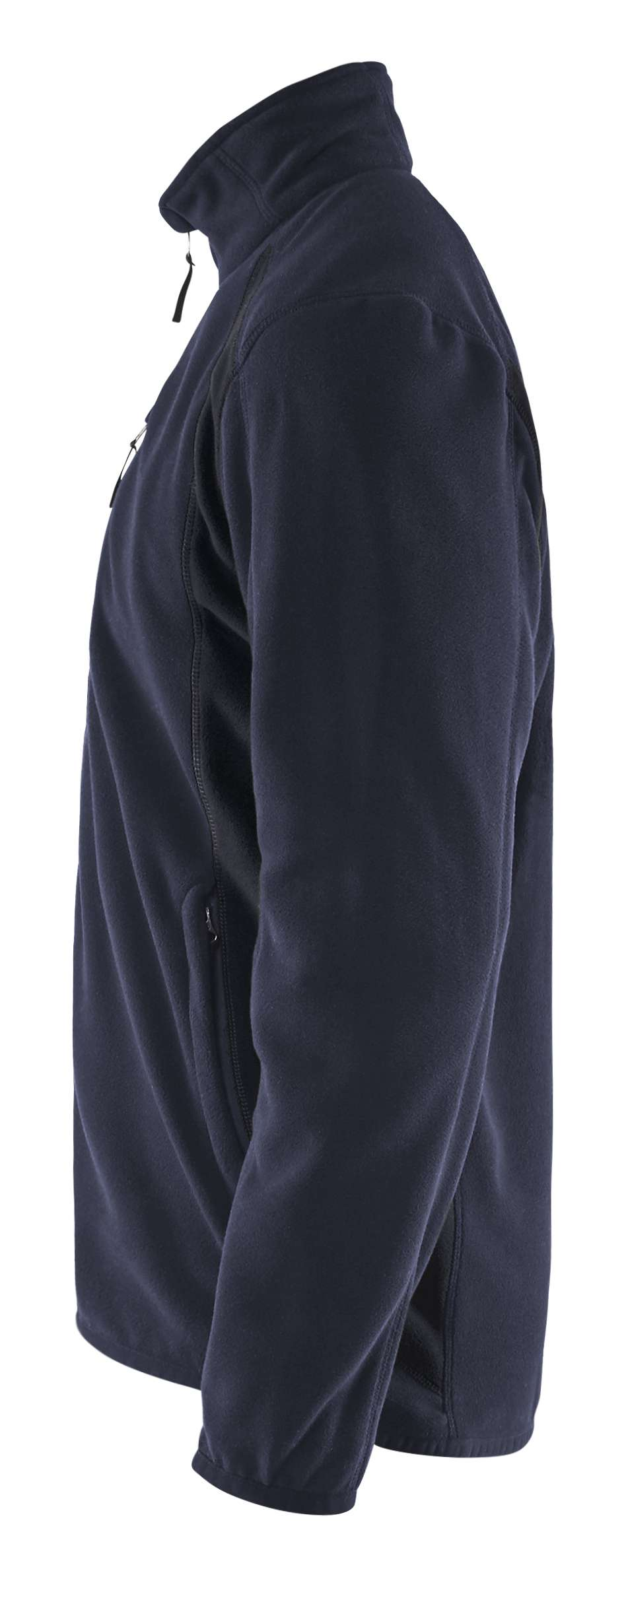 Blaklader Fleece vesten 47302510 donker marineblauw-zwart(8699)